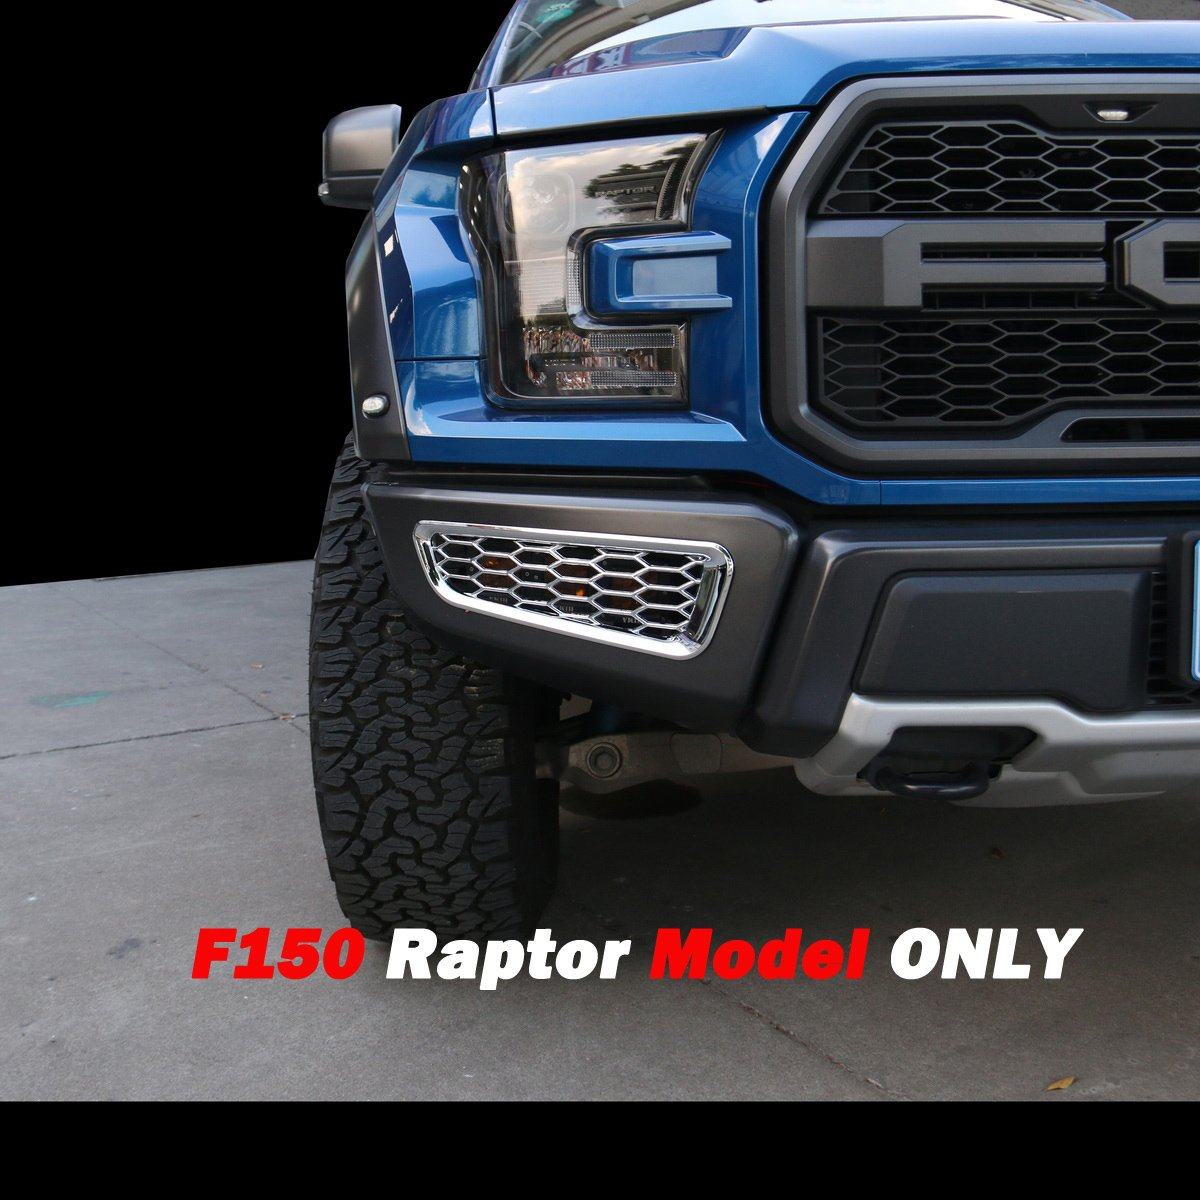 Justautotrim Front bumper bottom Fog Vent Chrome honeycomb Cover trim for 2016 2017 2018 Ford F150 Raptor Accessories